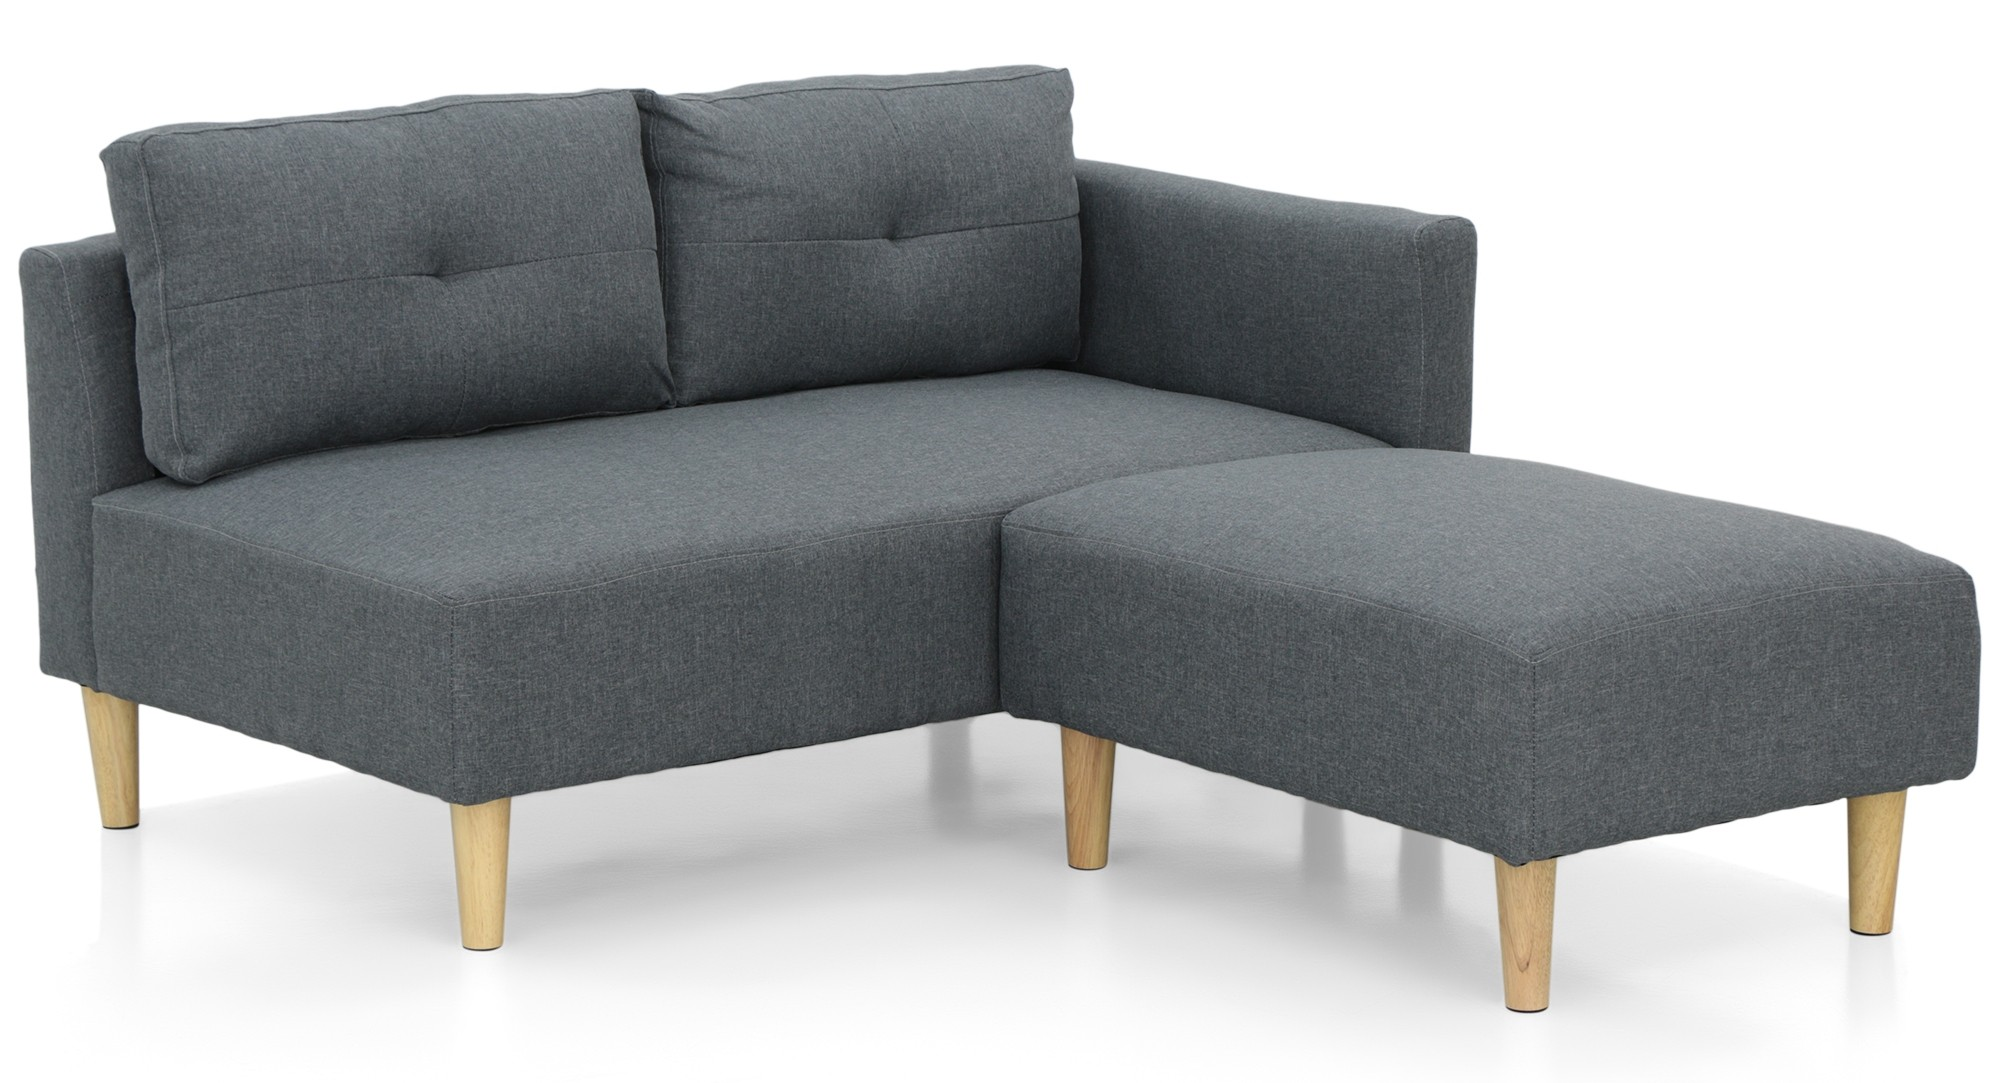 Nala Left Corner Sofa With Ottoman Grey Display Gallery Item 1 2